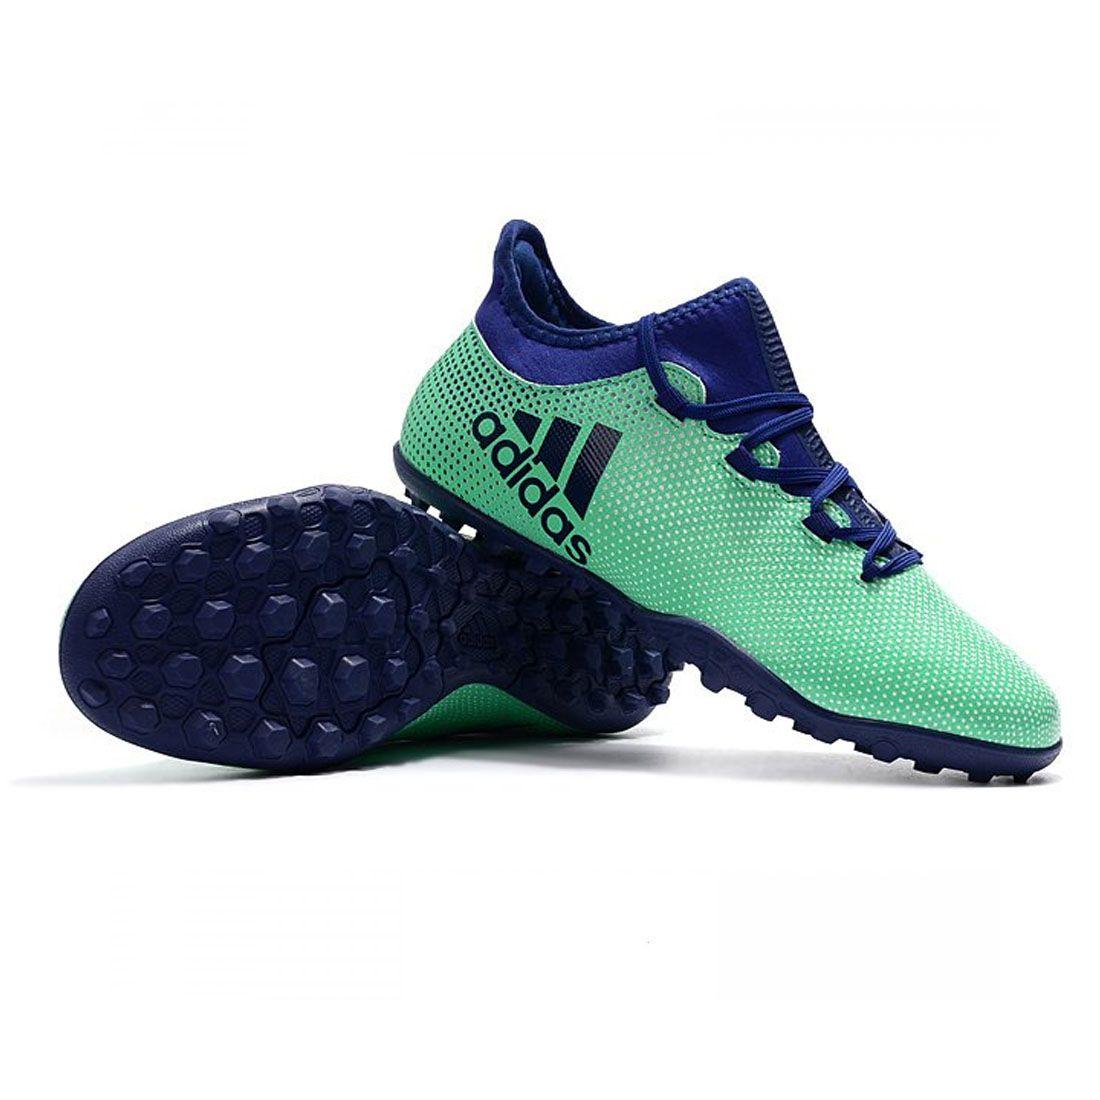 efca69fd410 Chuteira Adidas X Tango 17.3 TF Society Green N°41